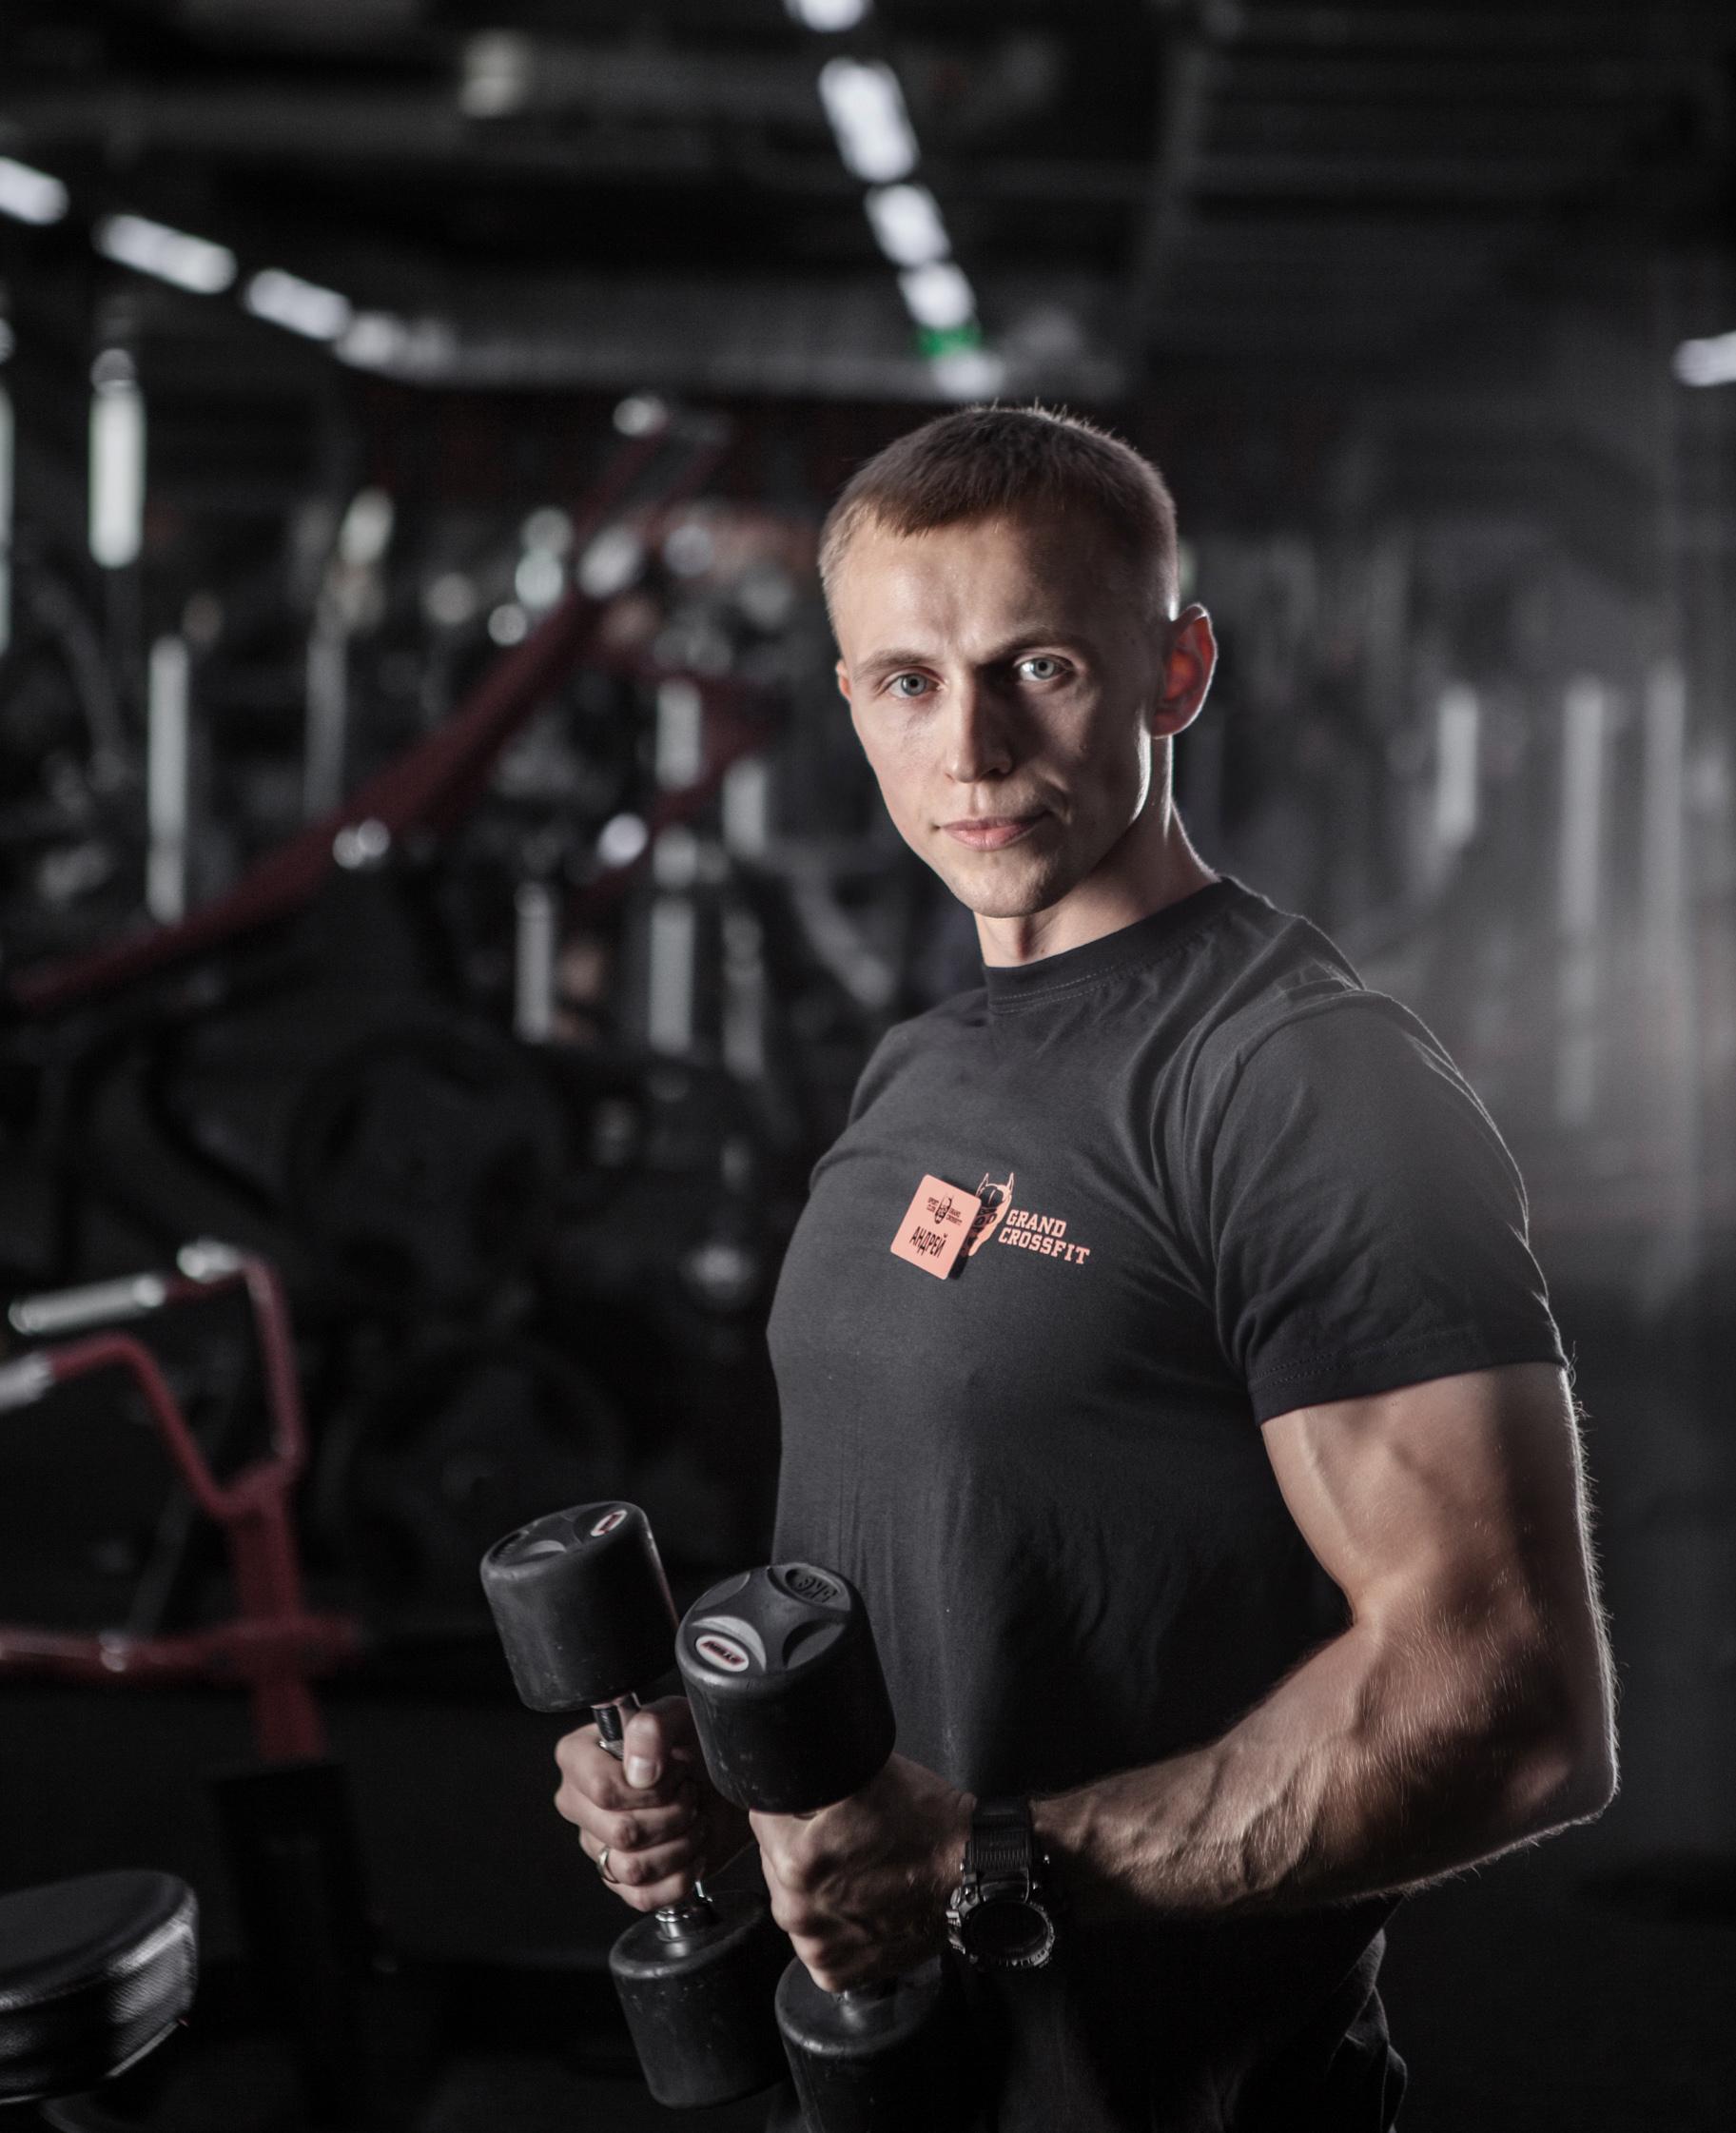 Андрей Гомзяк, DOG & Grand CrossFit